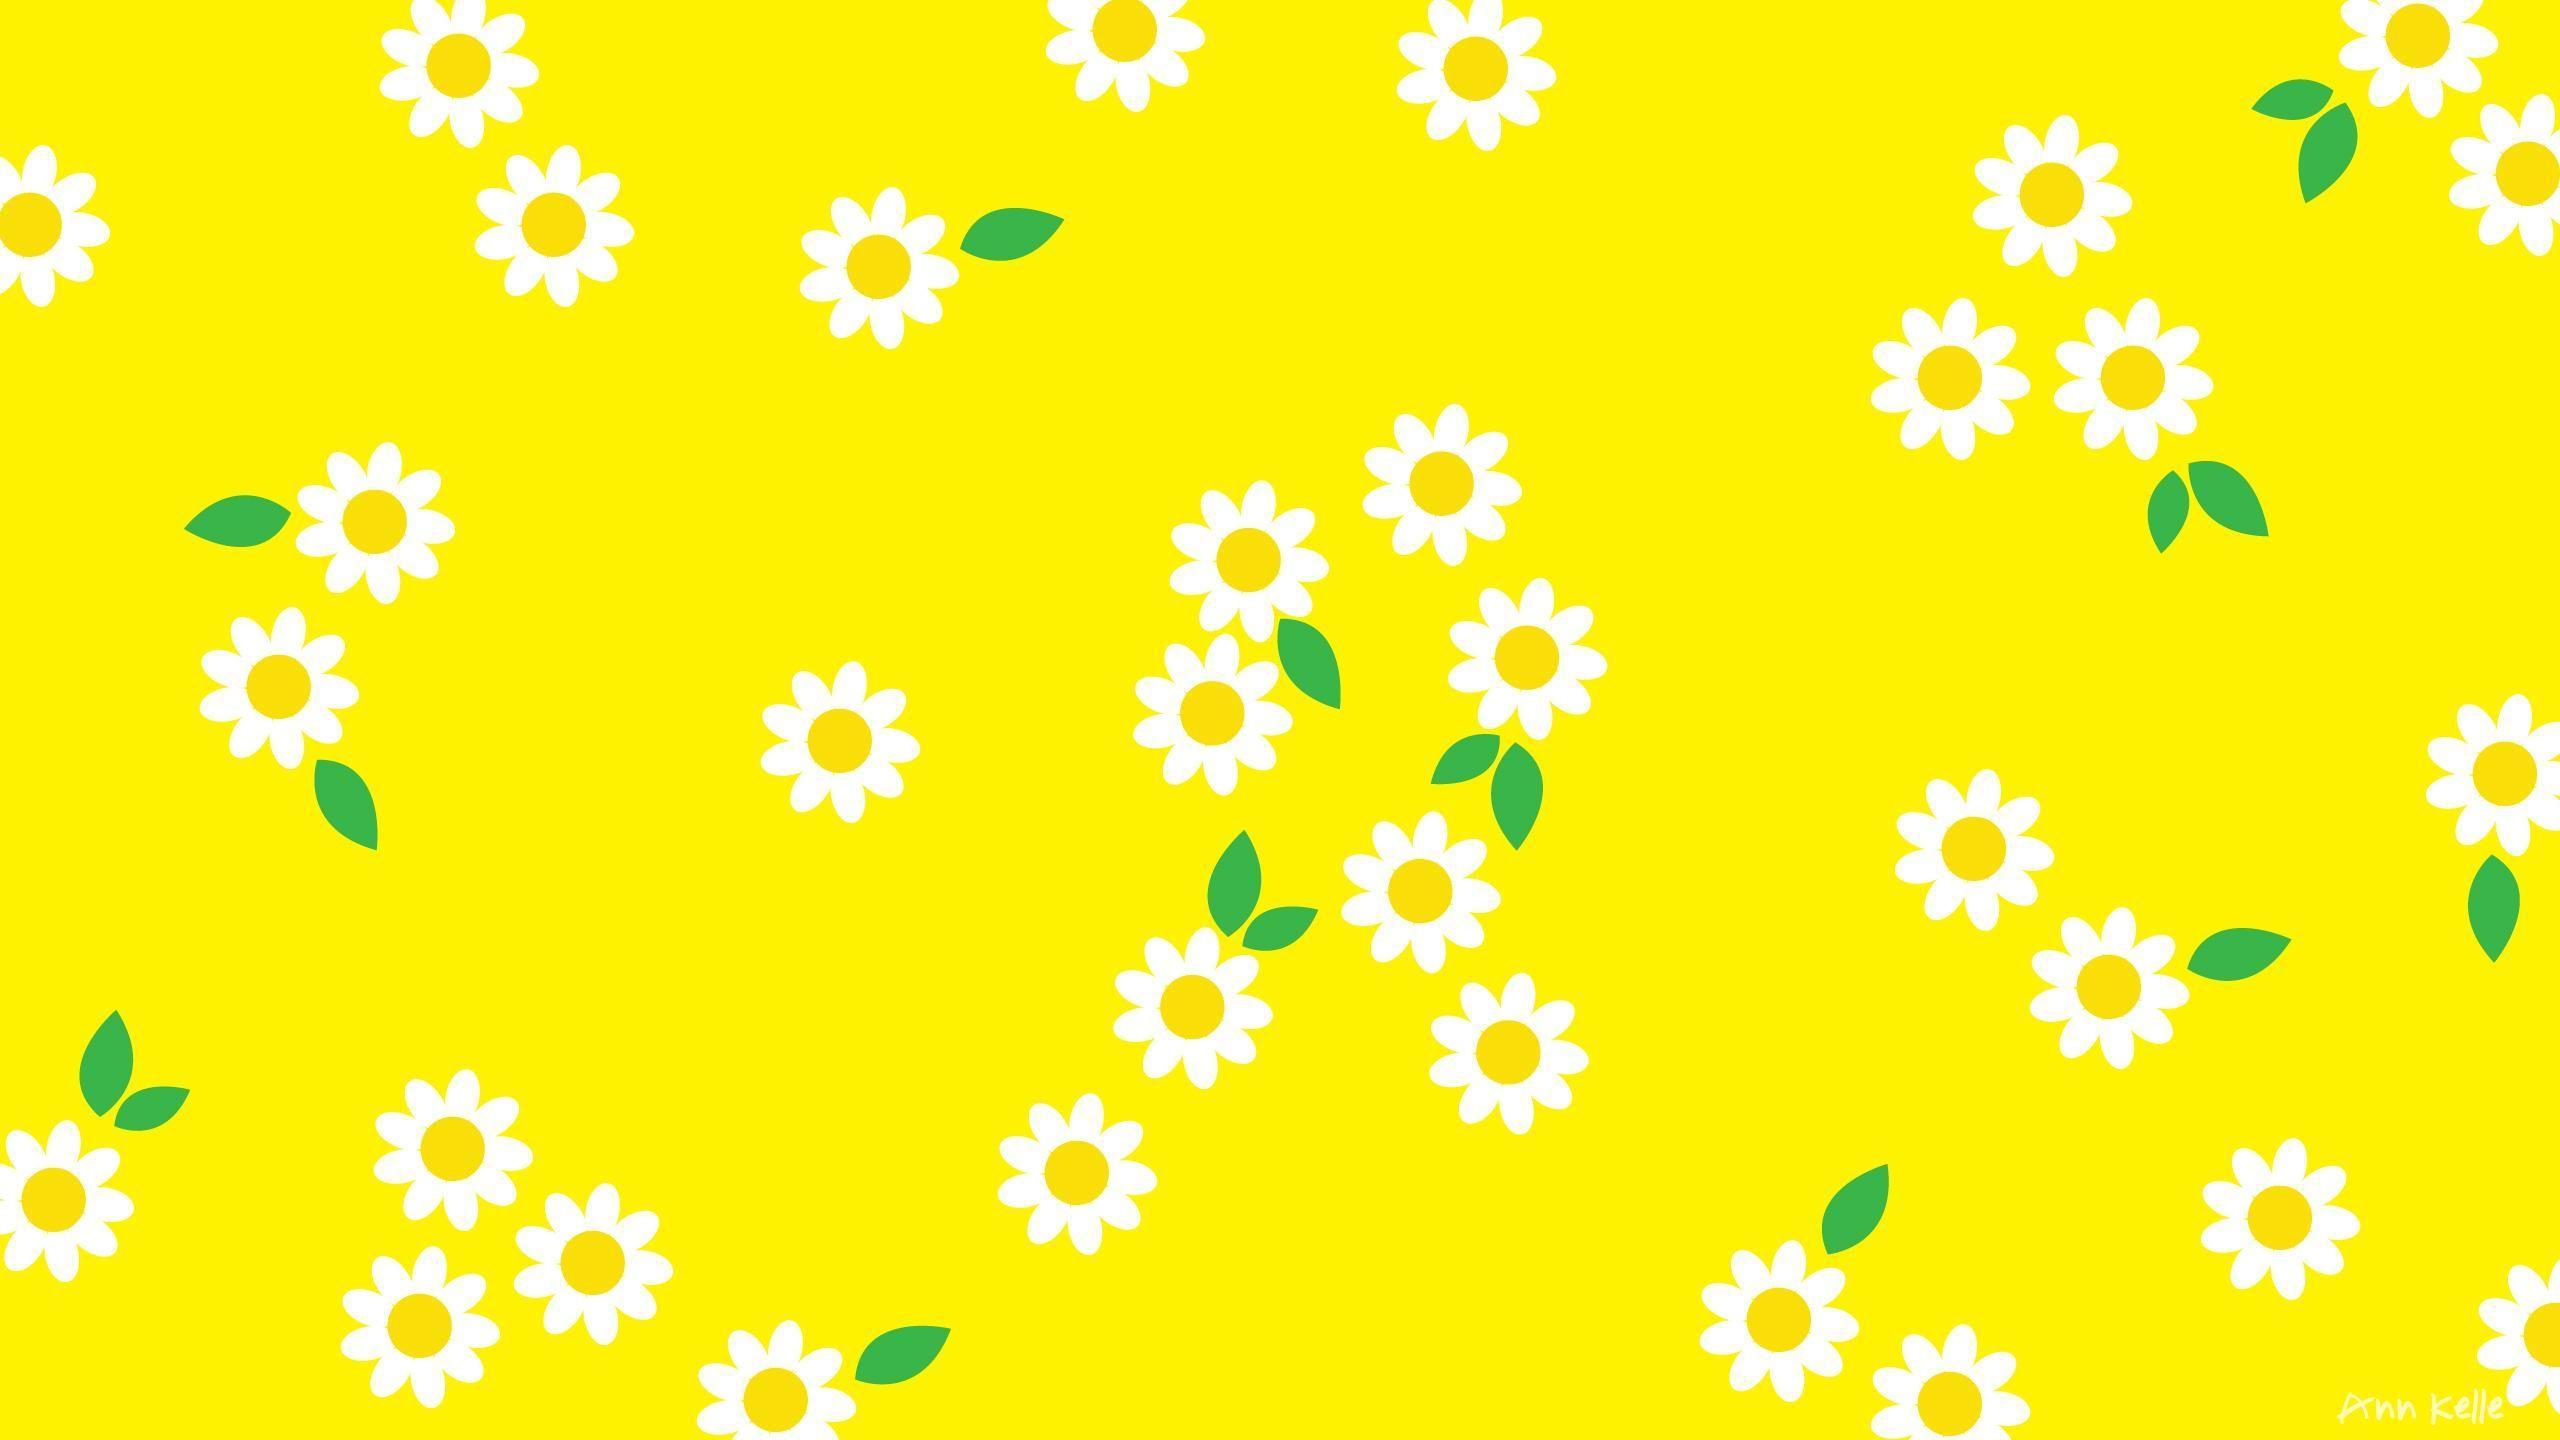 Yellow Desktop Wallpapers Top Free Yellow Desktop Backgrounds Wallpaperaccess